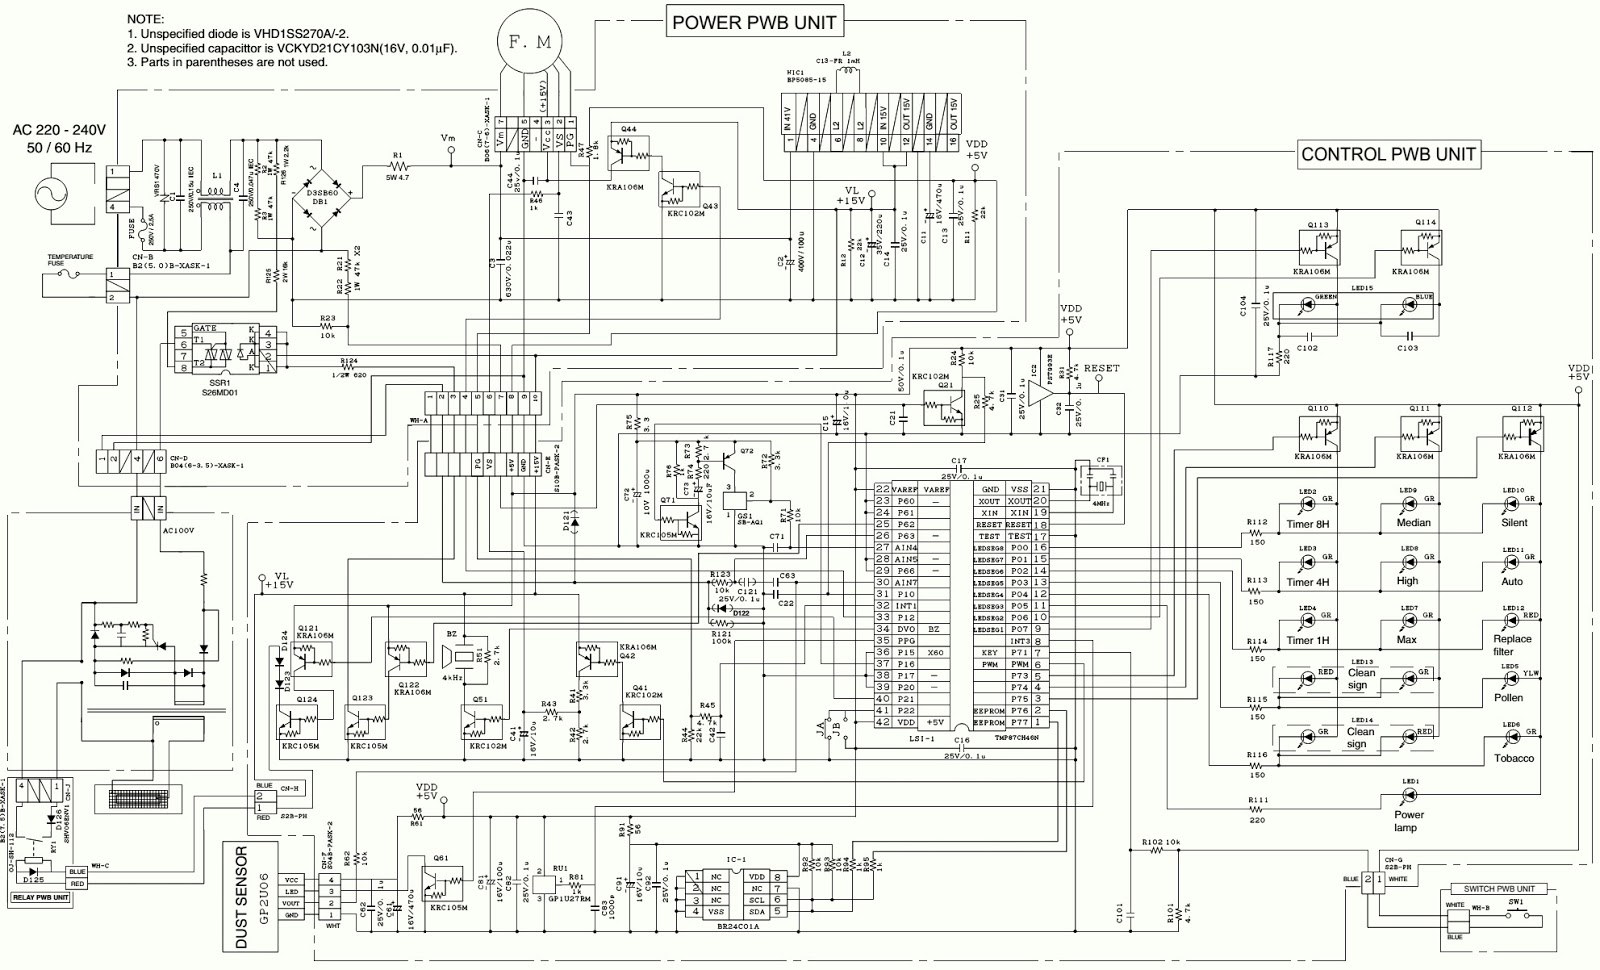 air filter schematics 5 19 sg dbd de u2022air purifier wiring diagram wiring diagram fuse [ 1600 x 970 Pixel ]